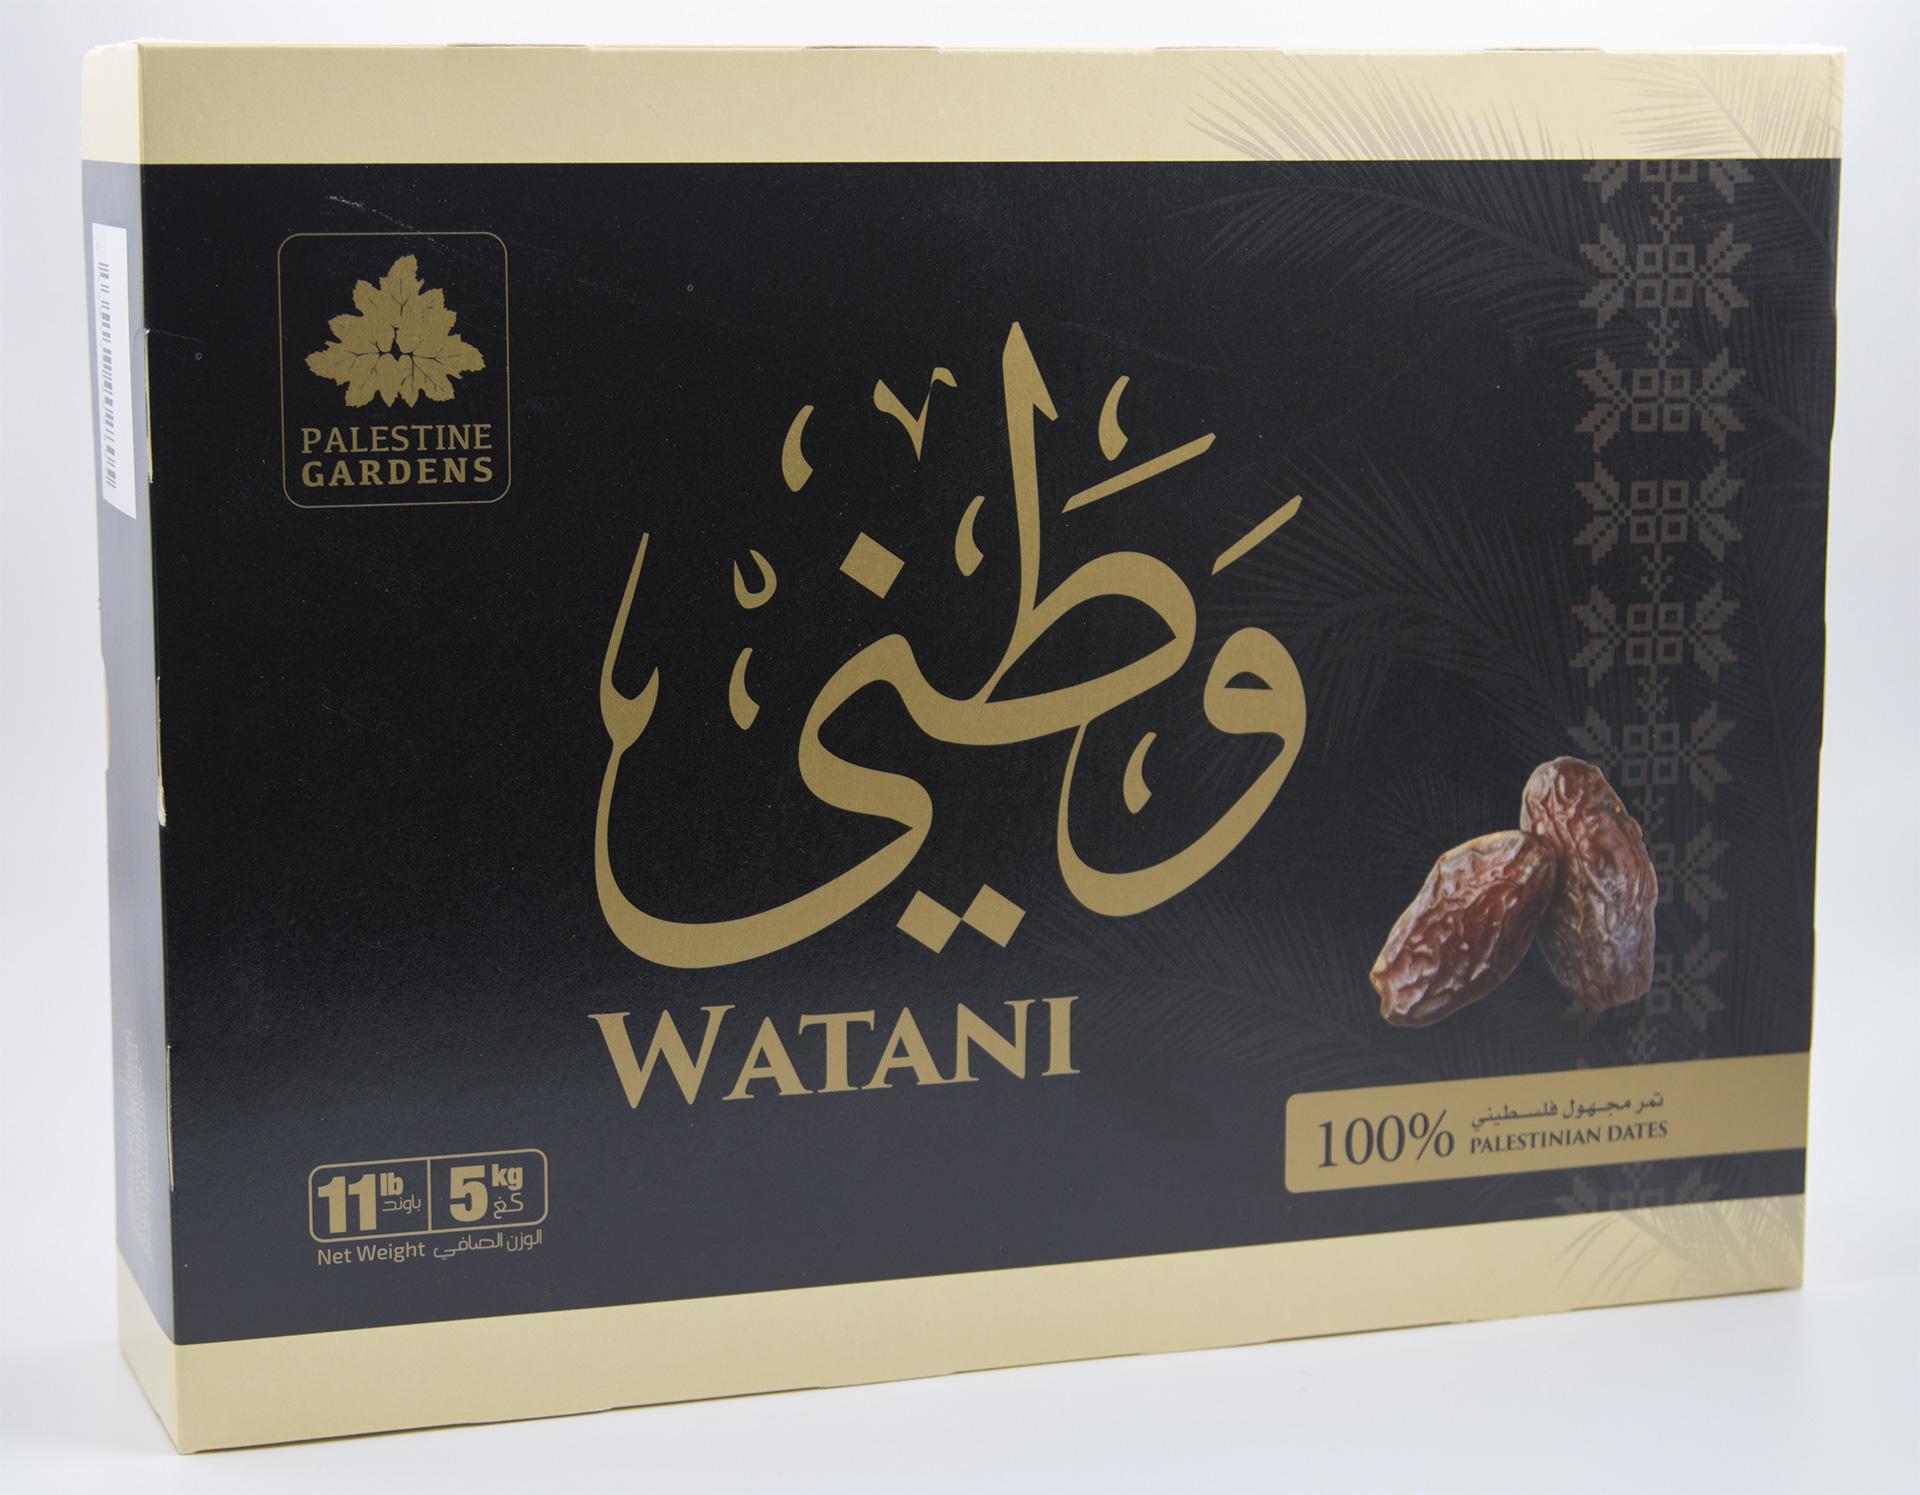 Watani 5Kg